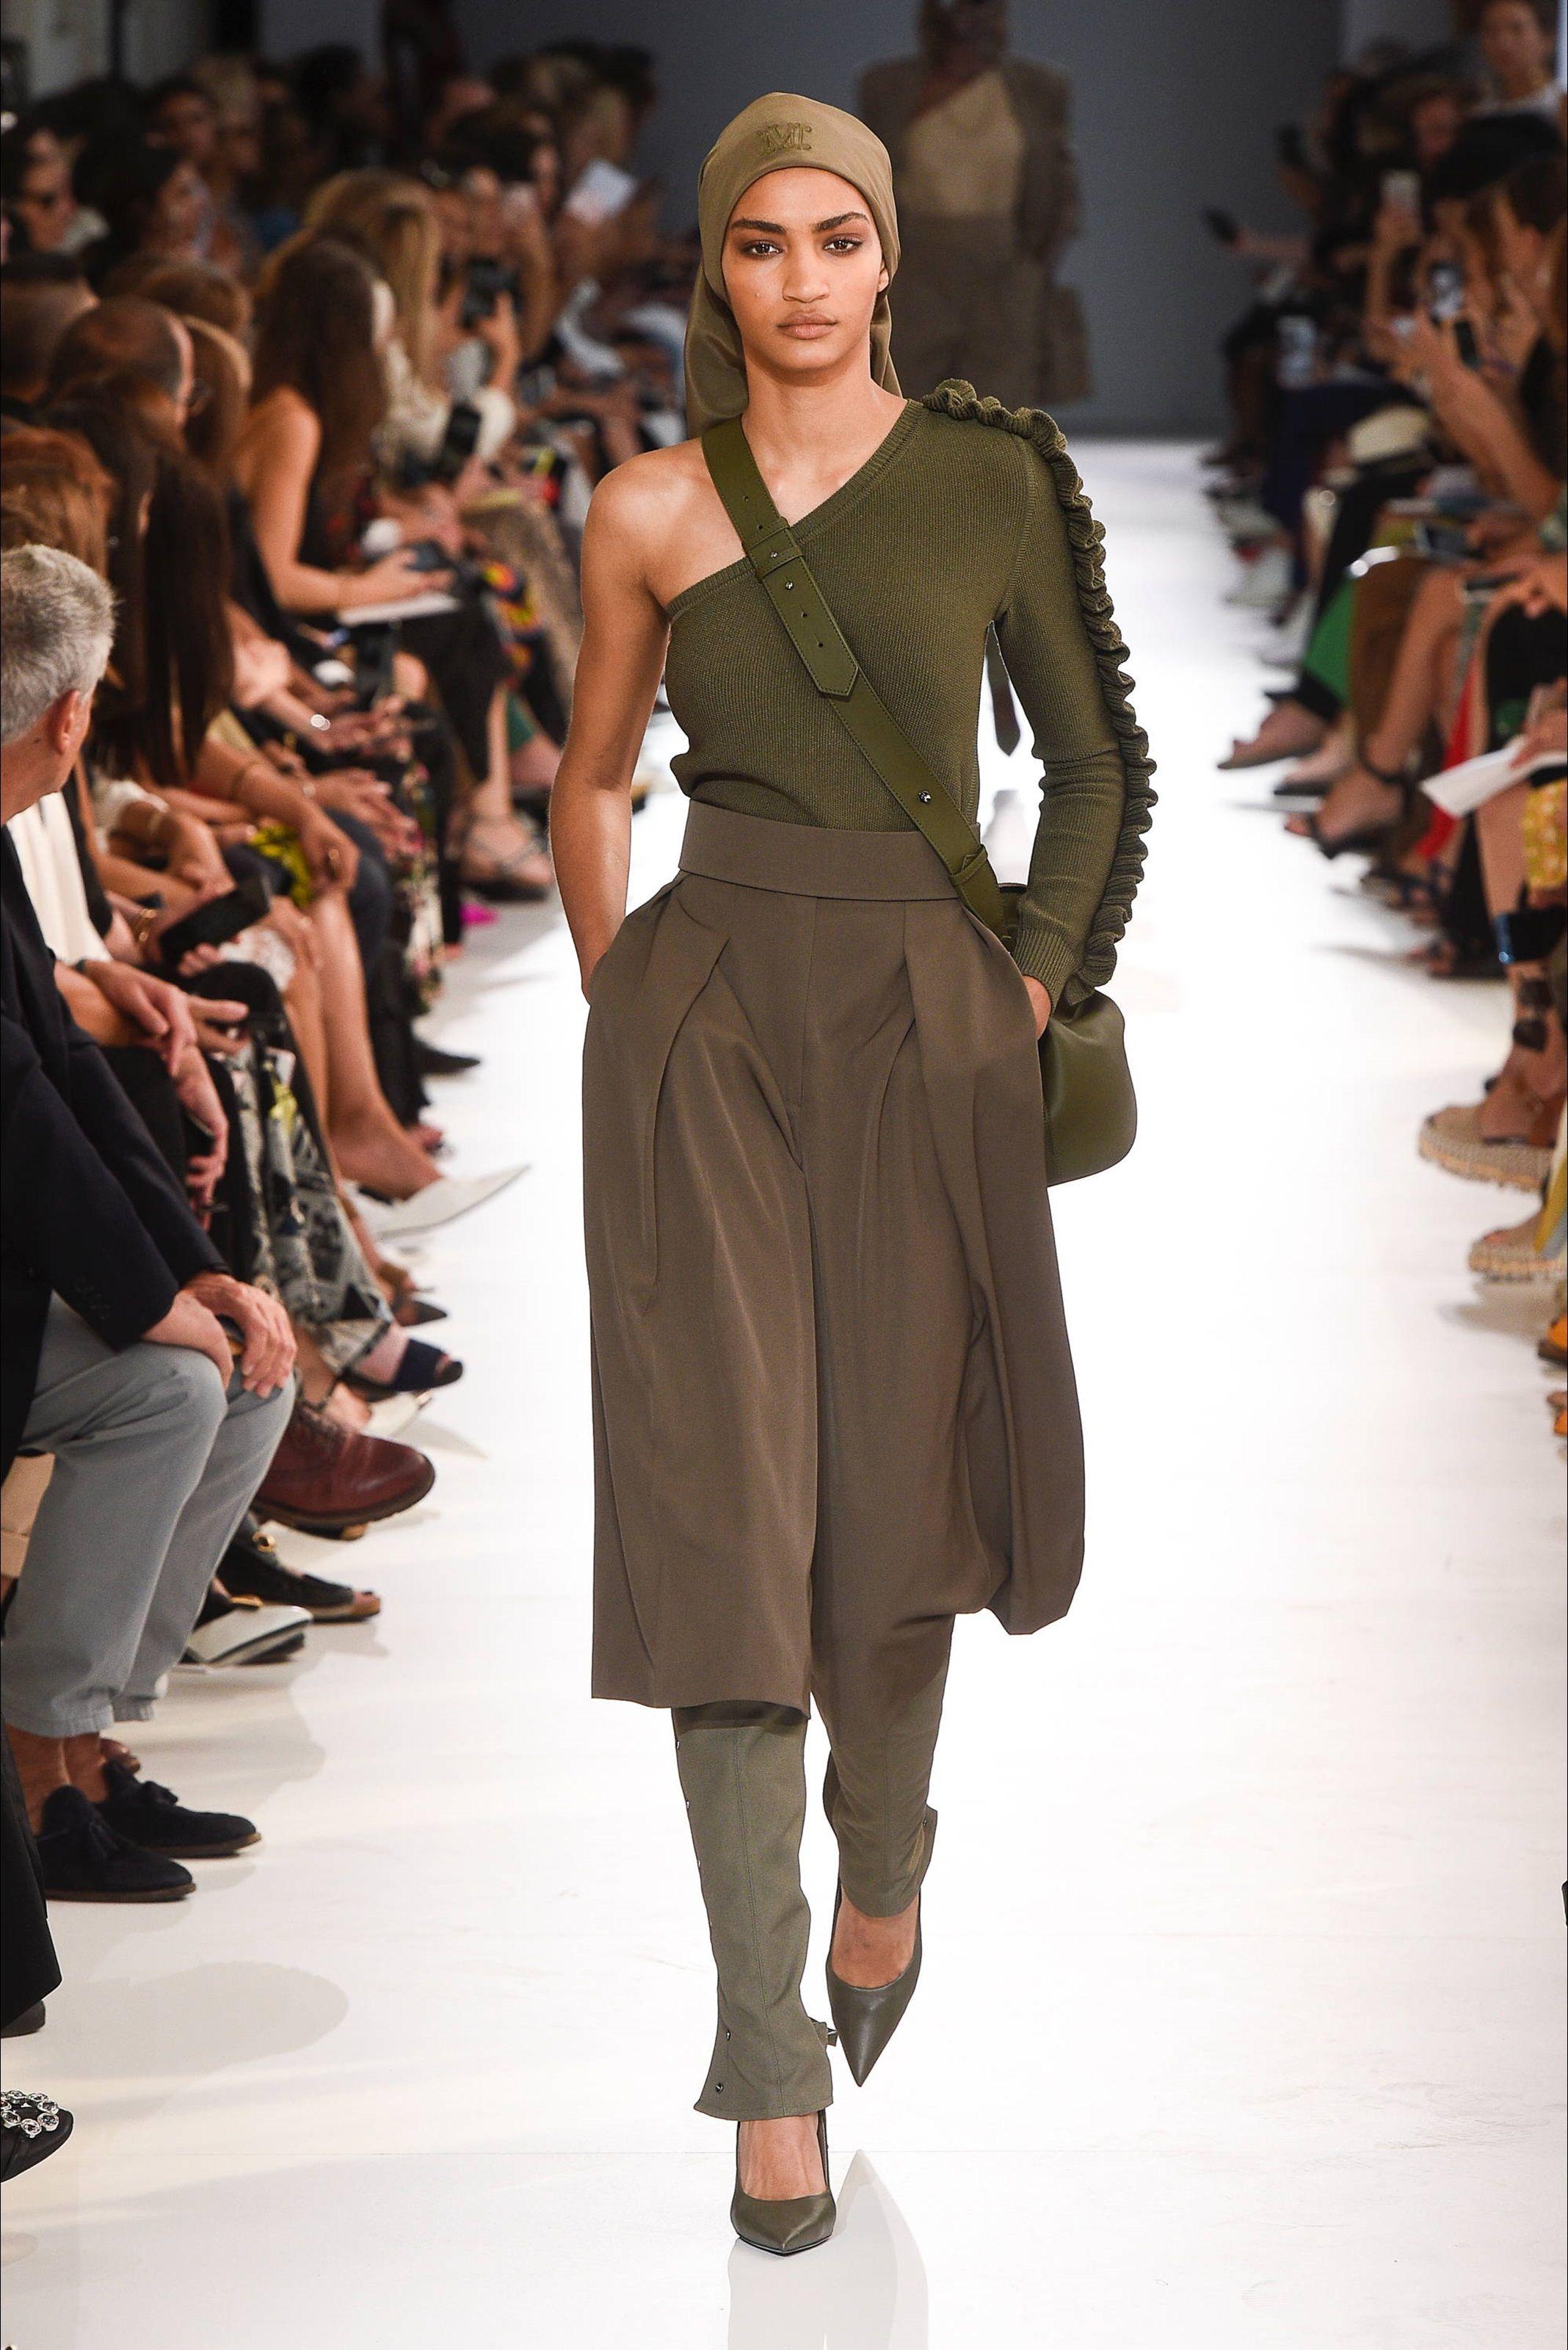 47282d4524af Sfilata Max Mara Milano - Collezioni Primavera Estate 2019 - Vogue ...